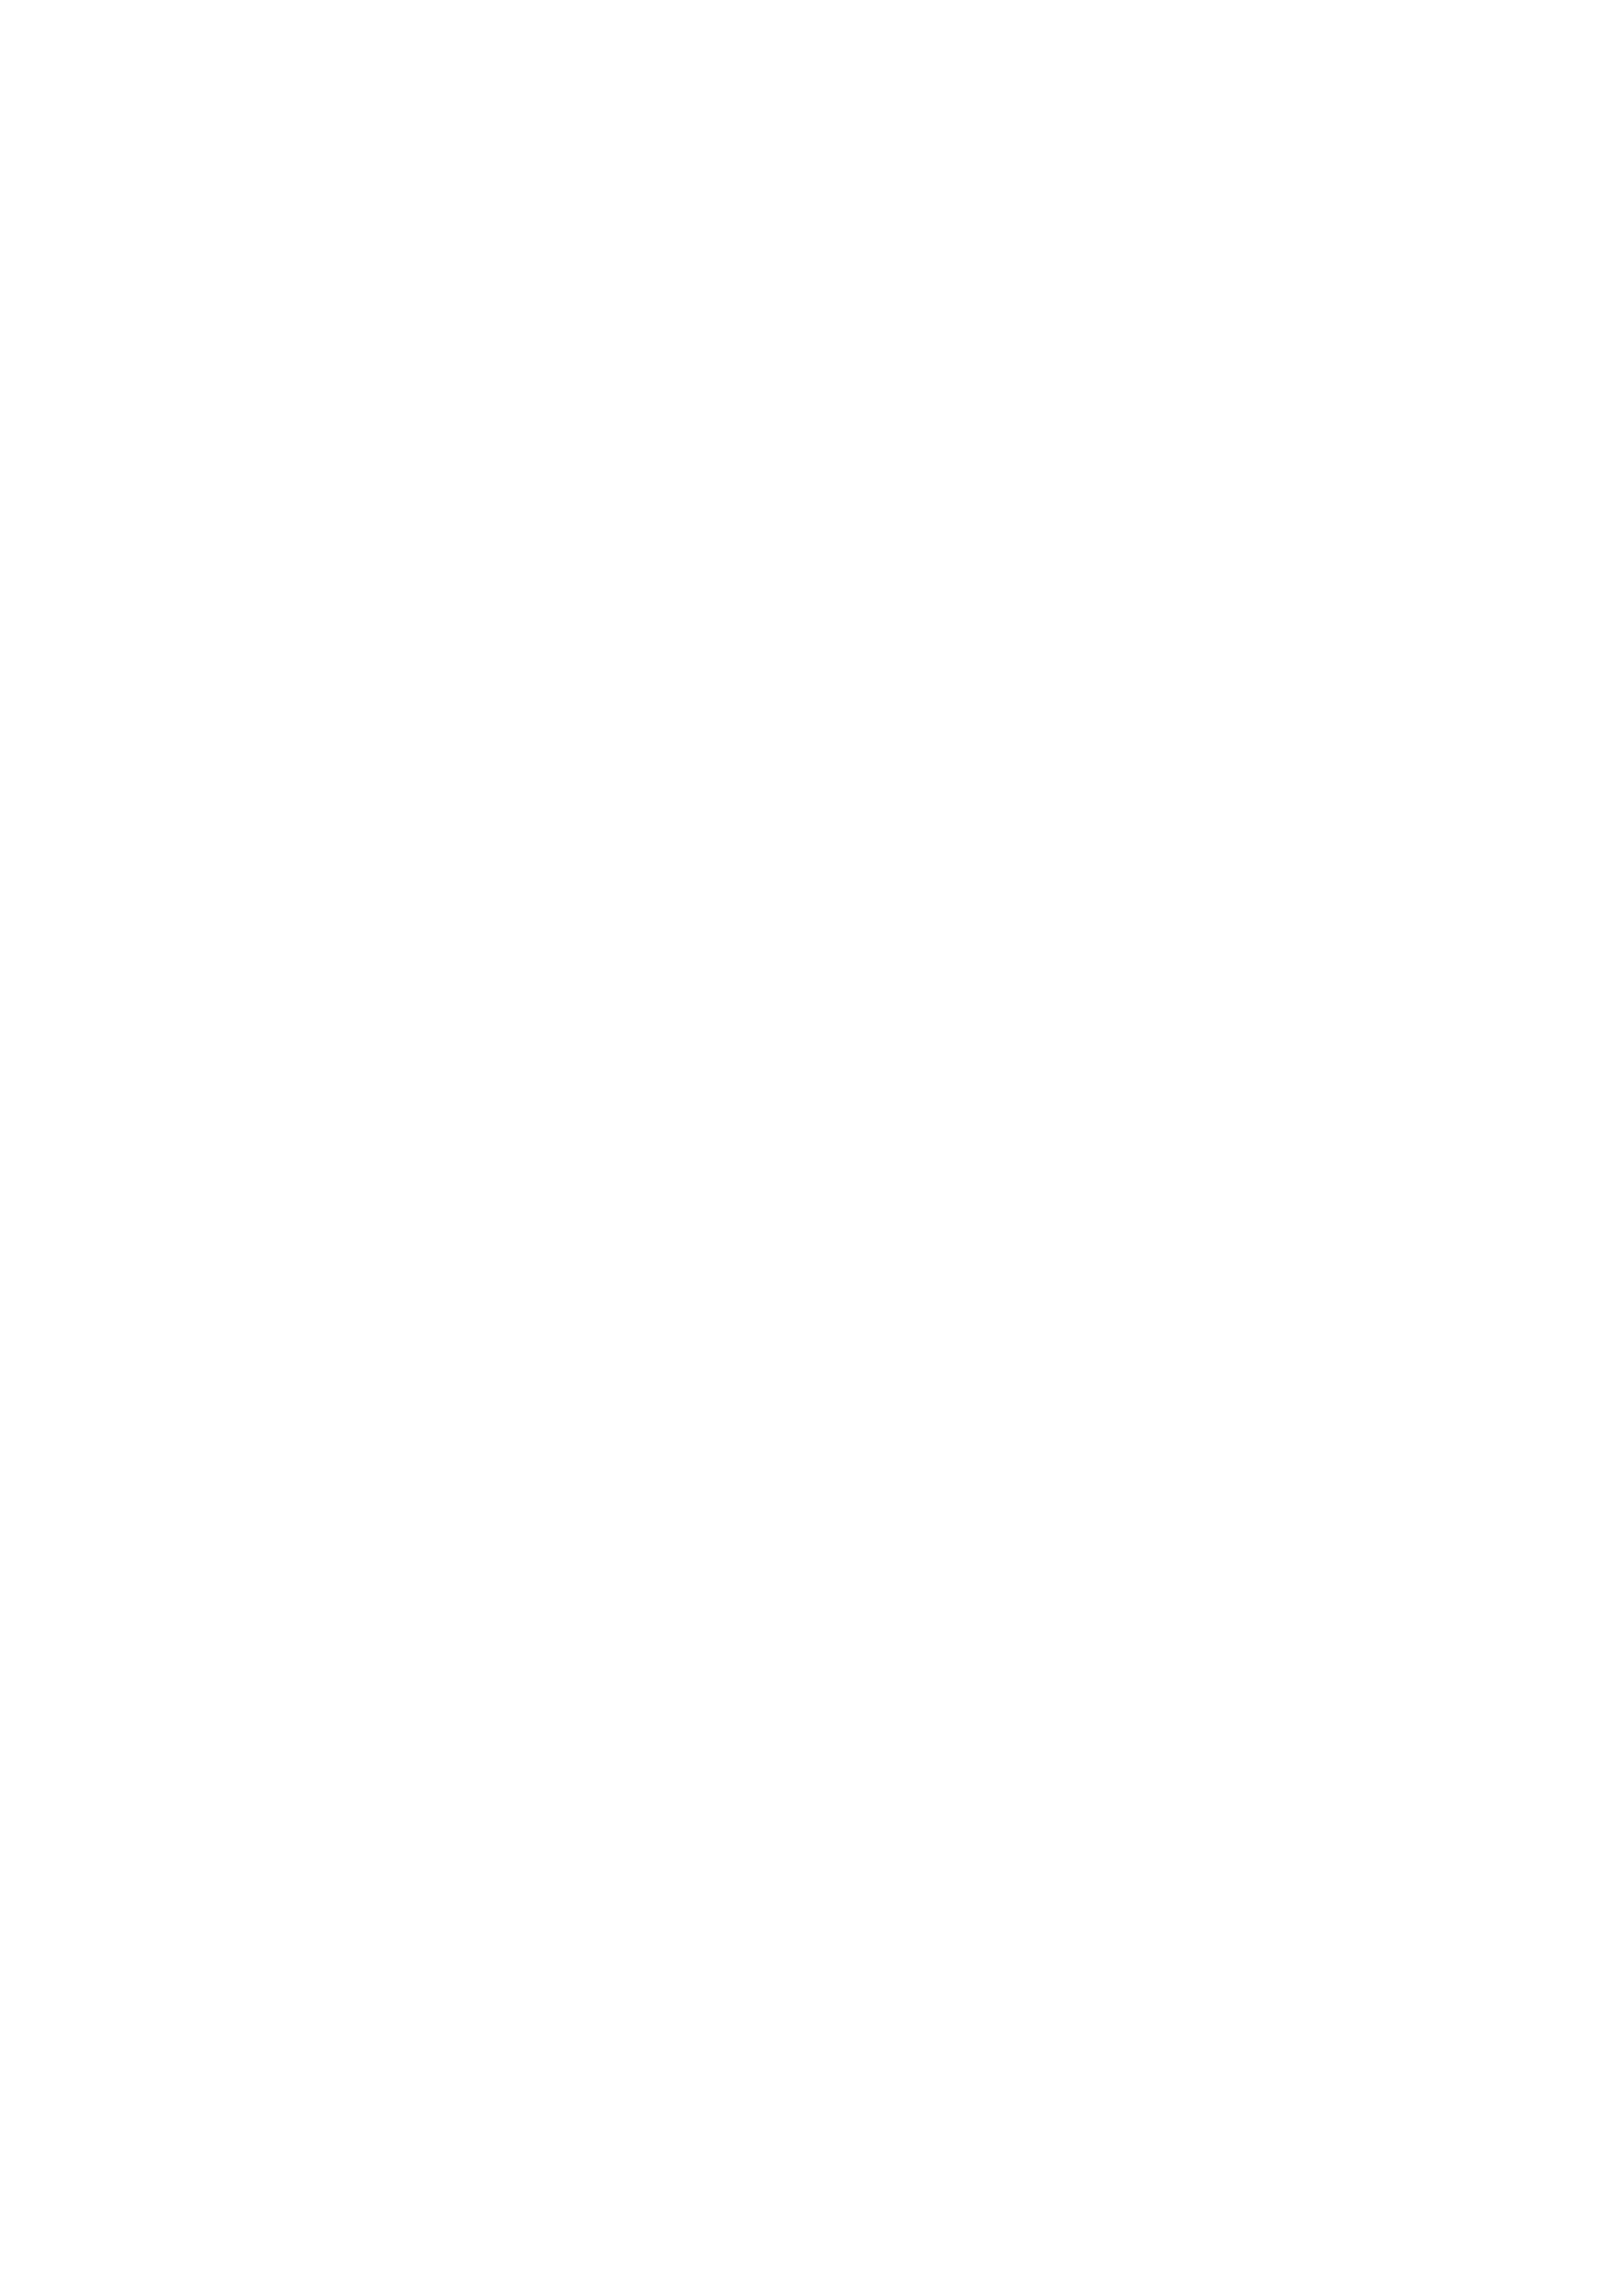 BİZİM MAHALLE